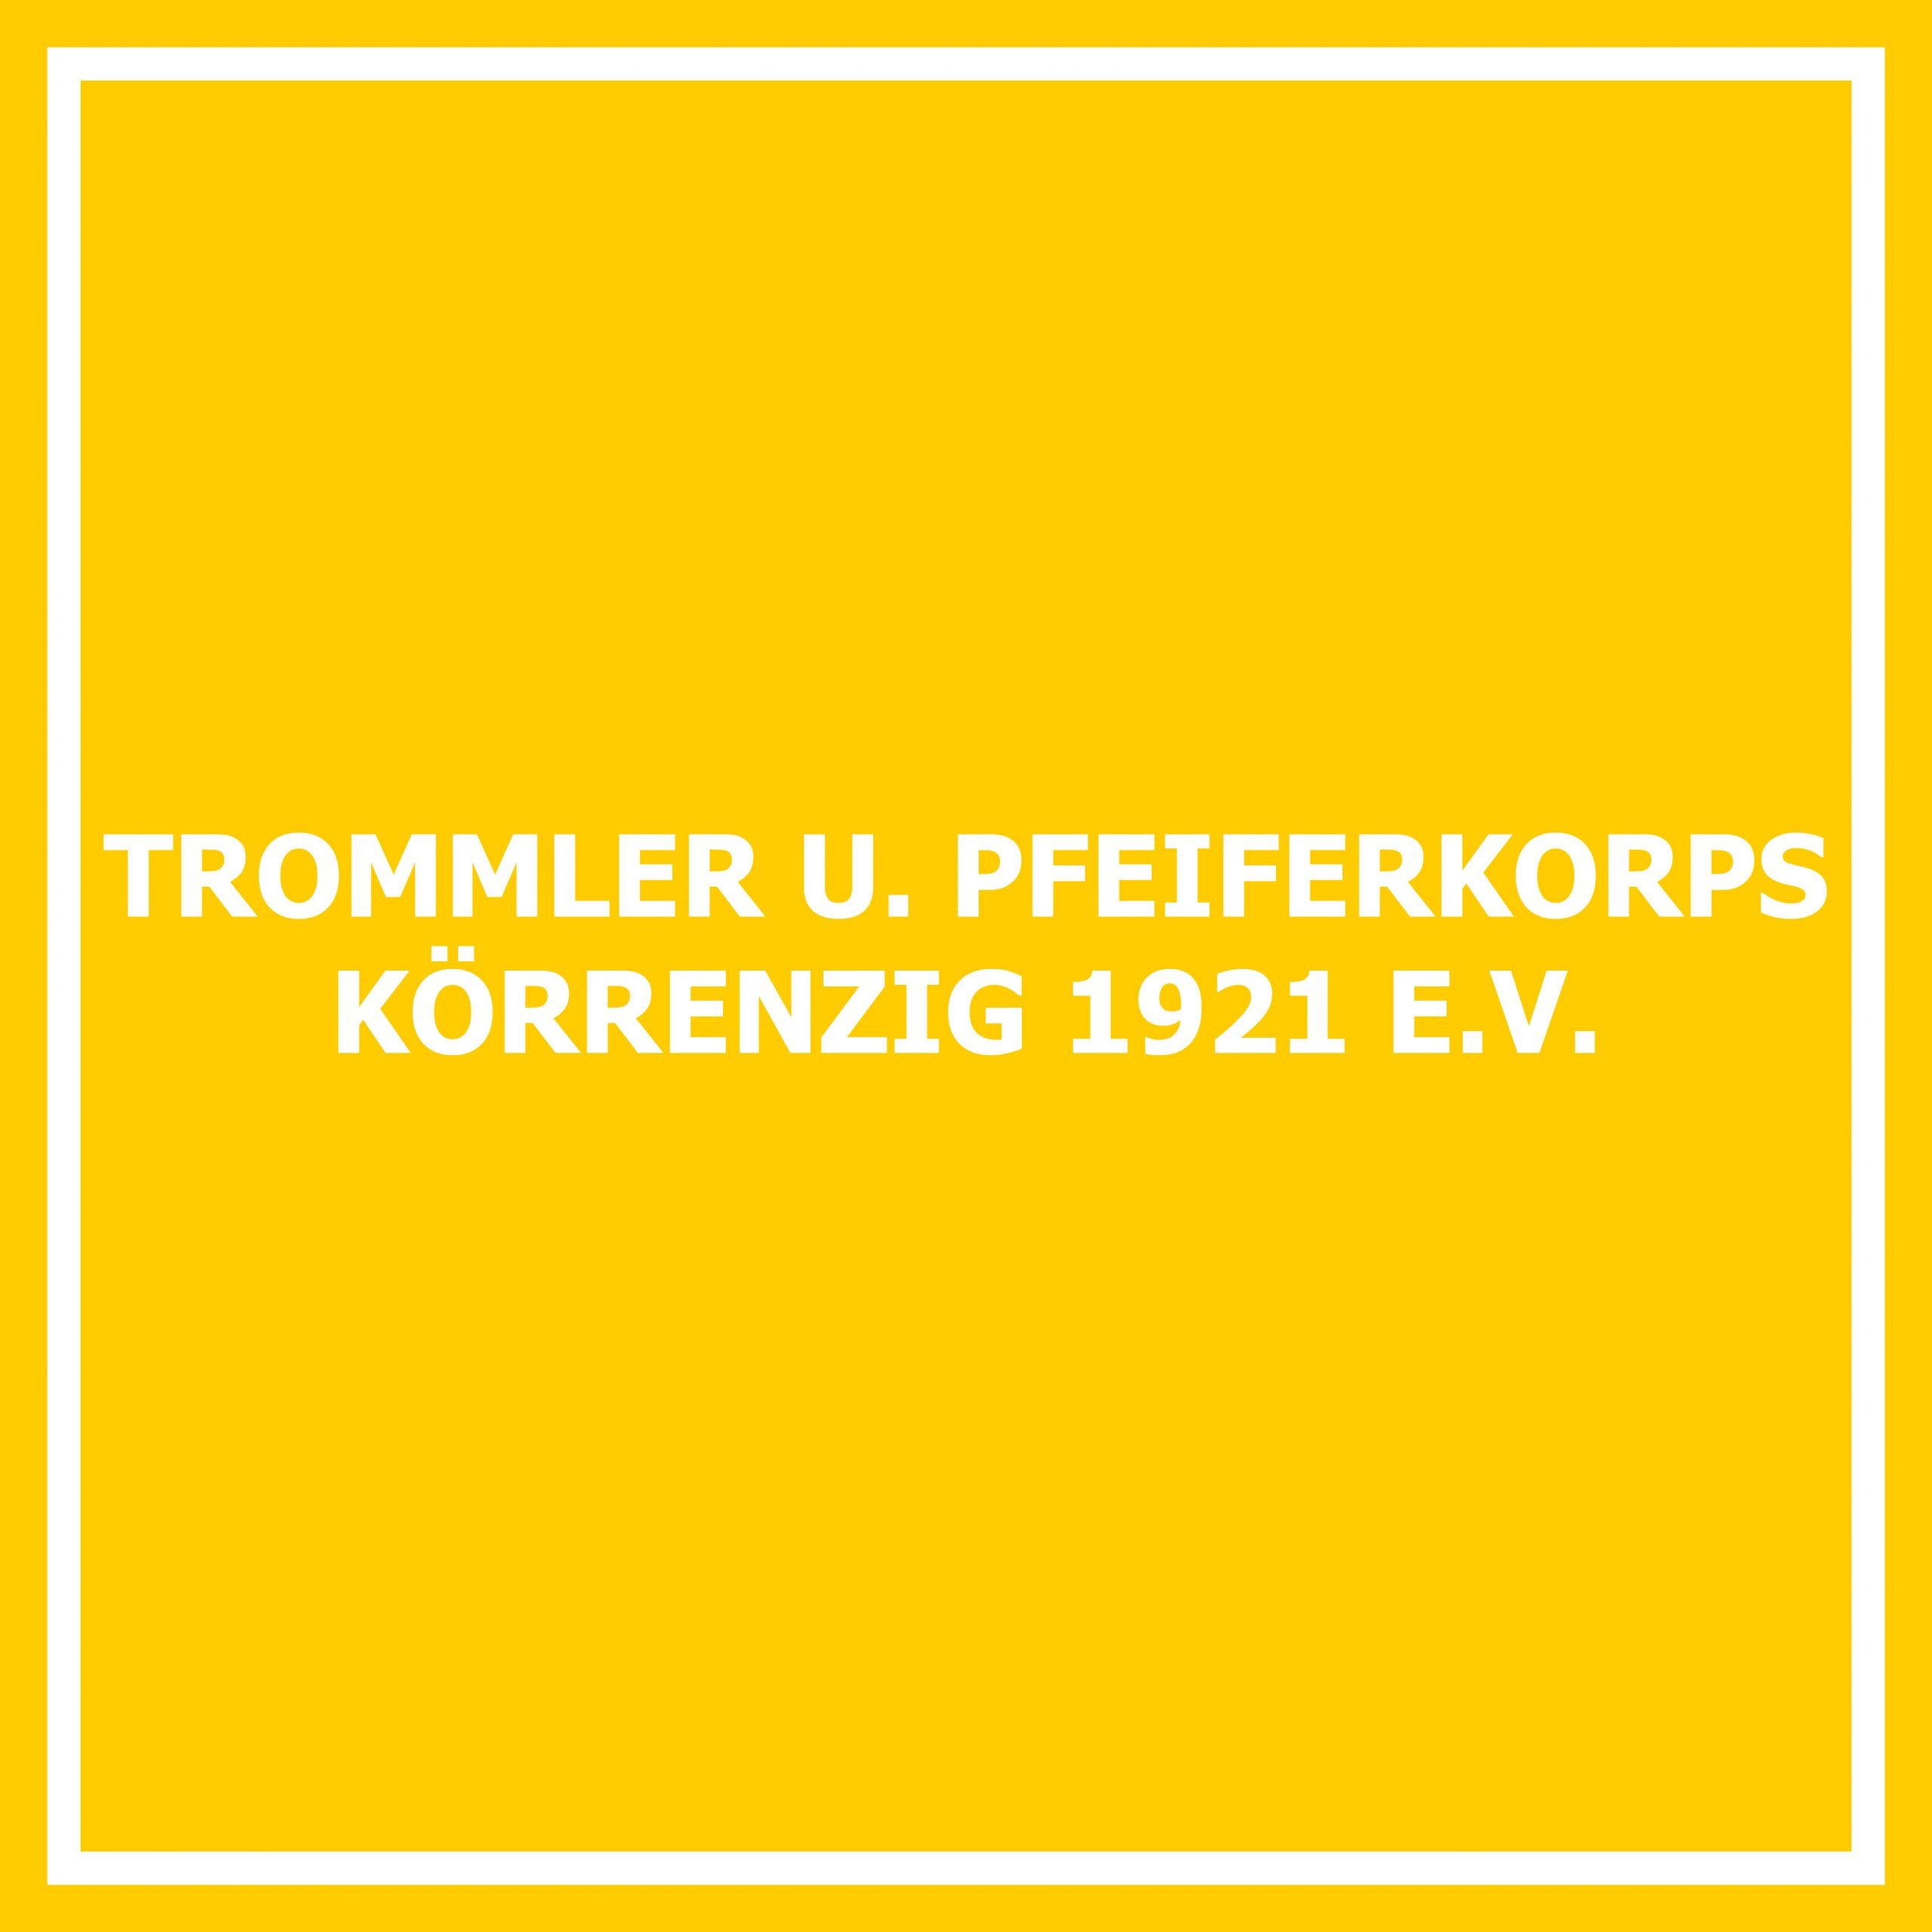 Trommler und Pfeiferkorps Körrenzig 1921 e. V.